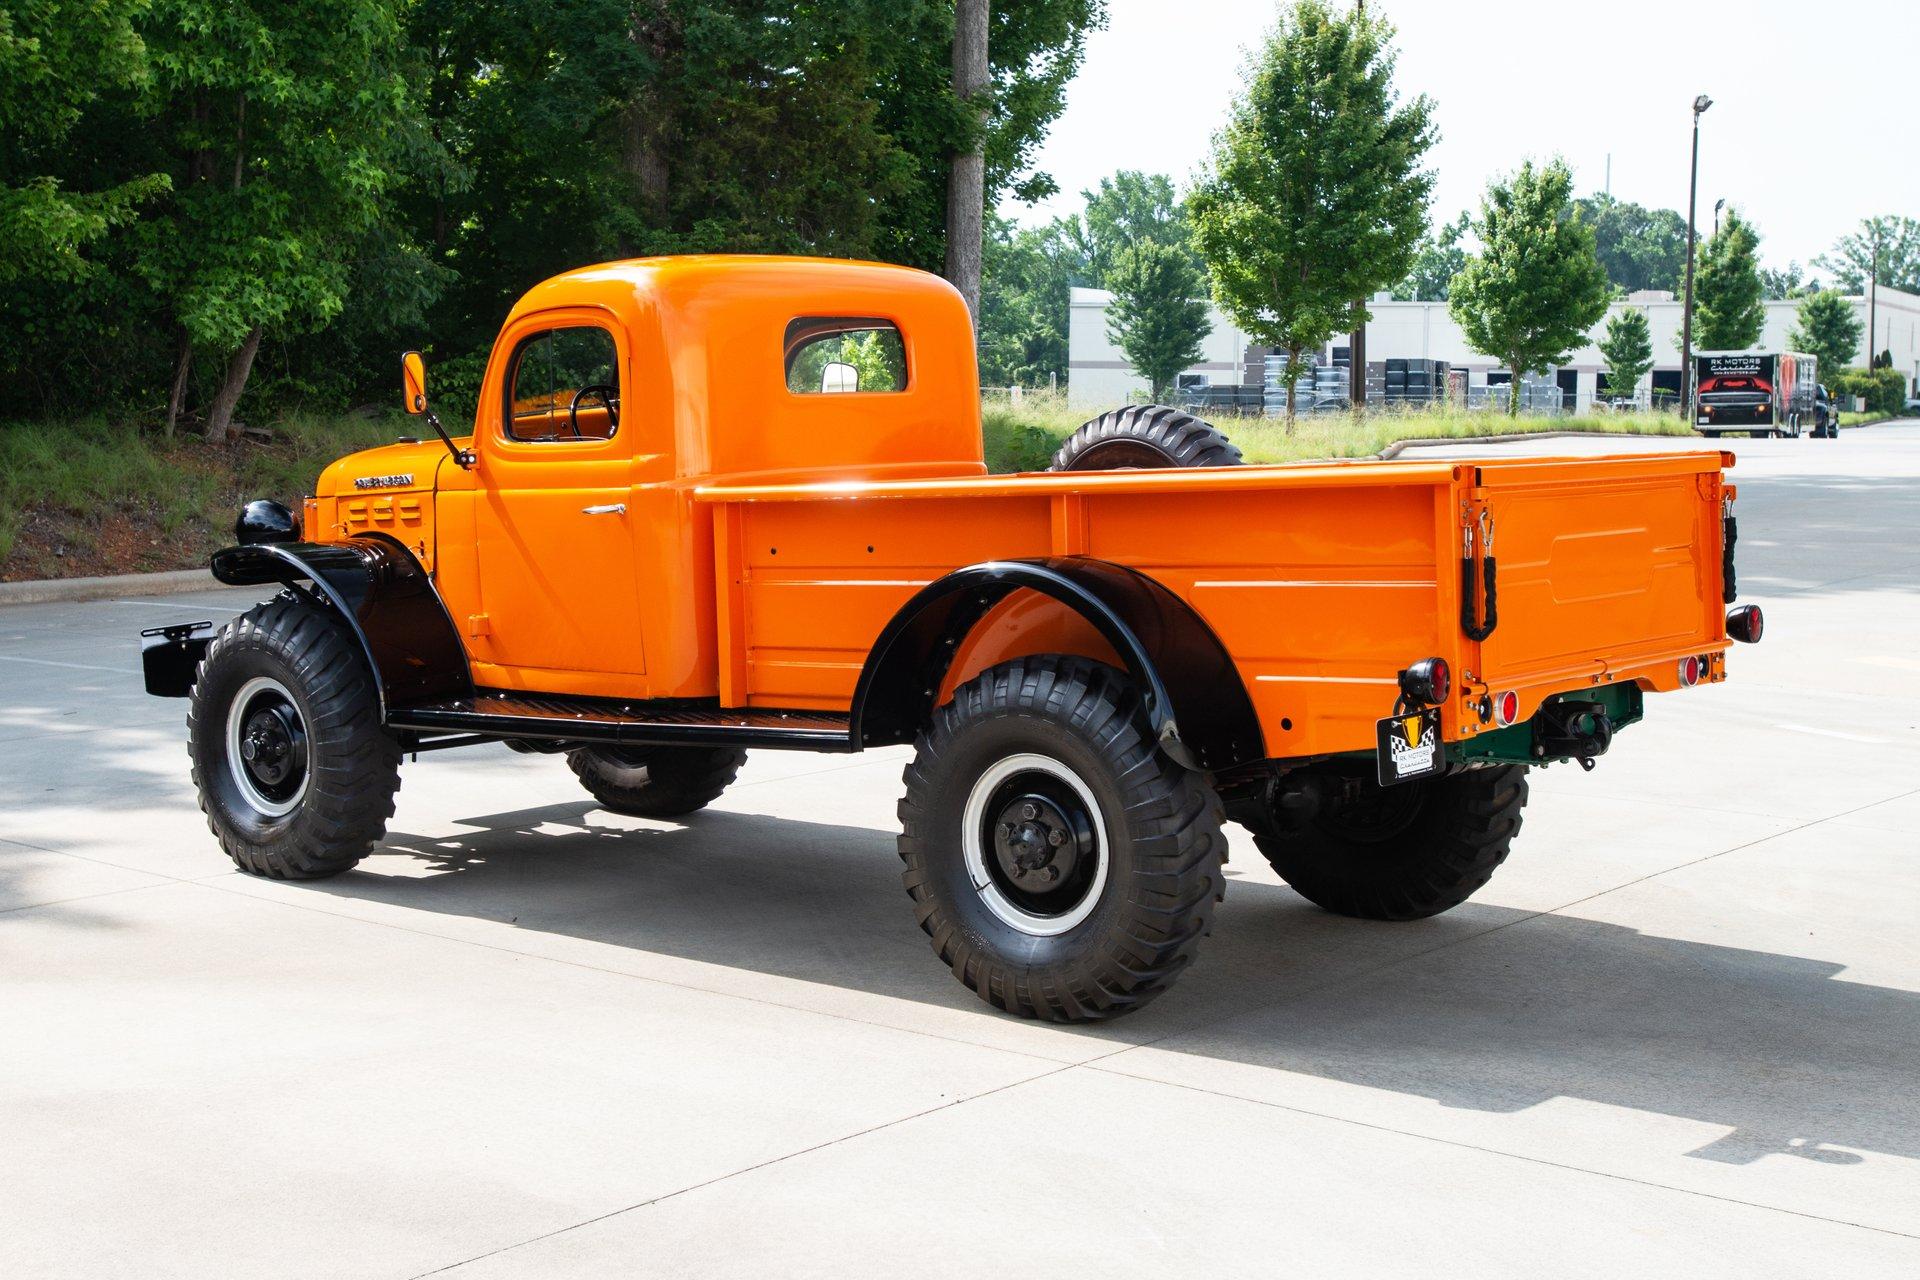 Ultimate Dodge Dodge Power Wagon Wm300 For Sale